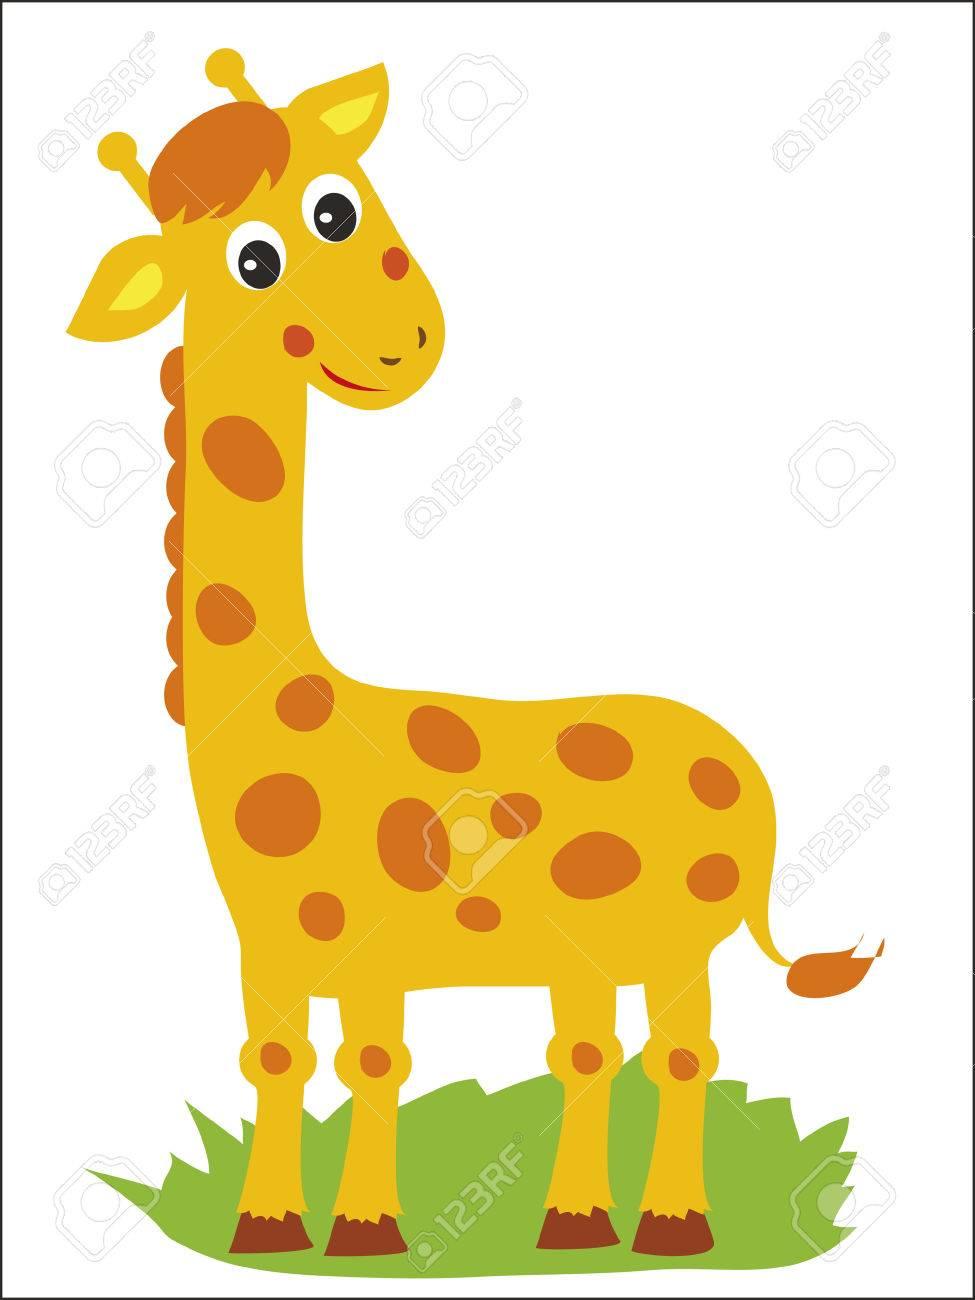 giraffe vector giraffe standing giraffe african animal jolly rh 123rf com giraffe vector silhouette giraffe vector free download